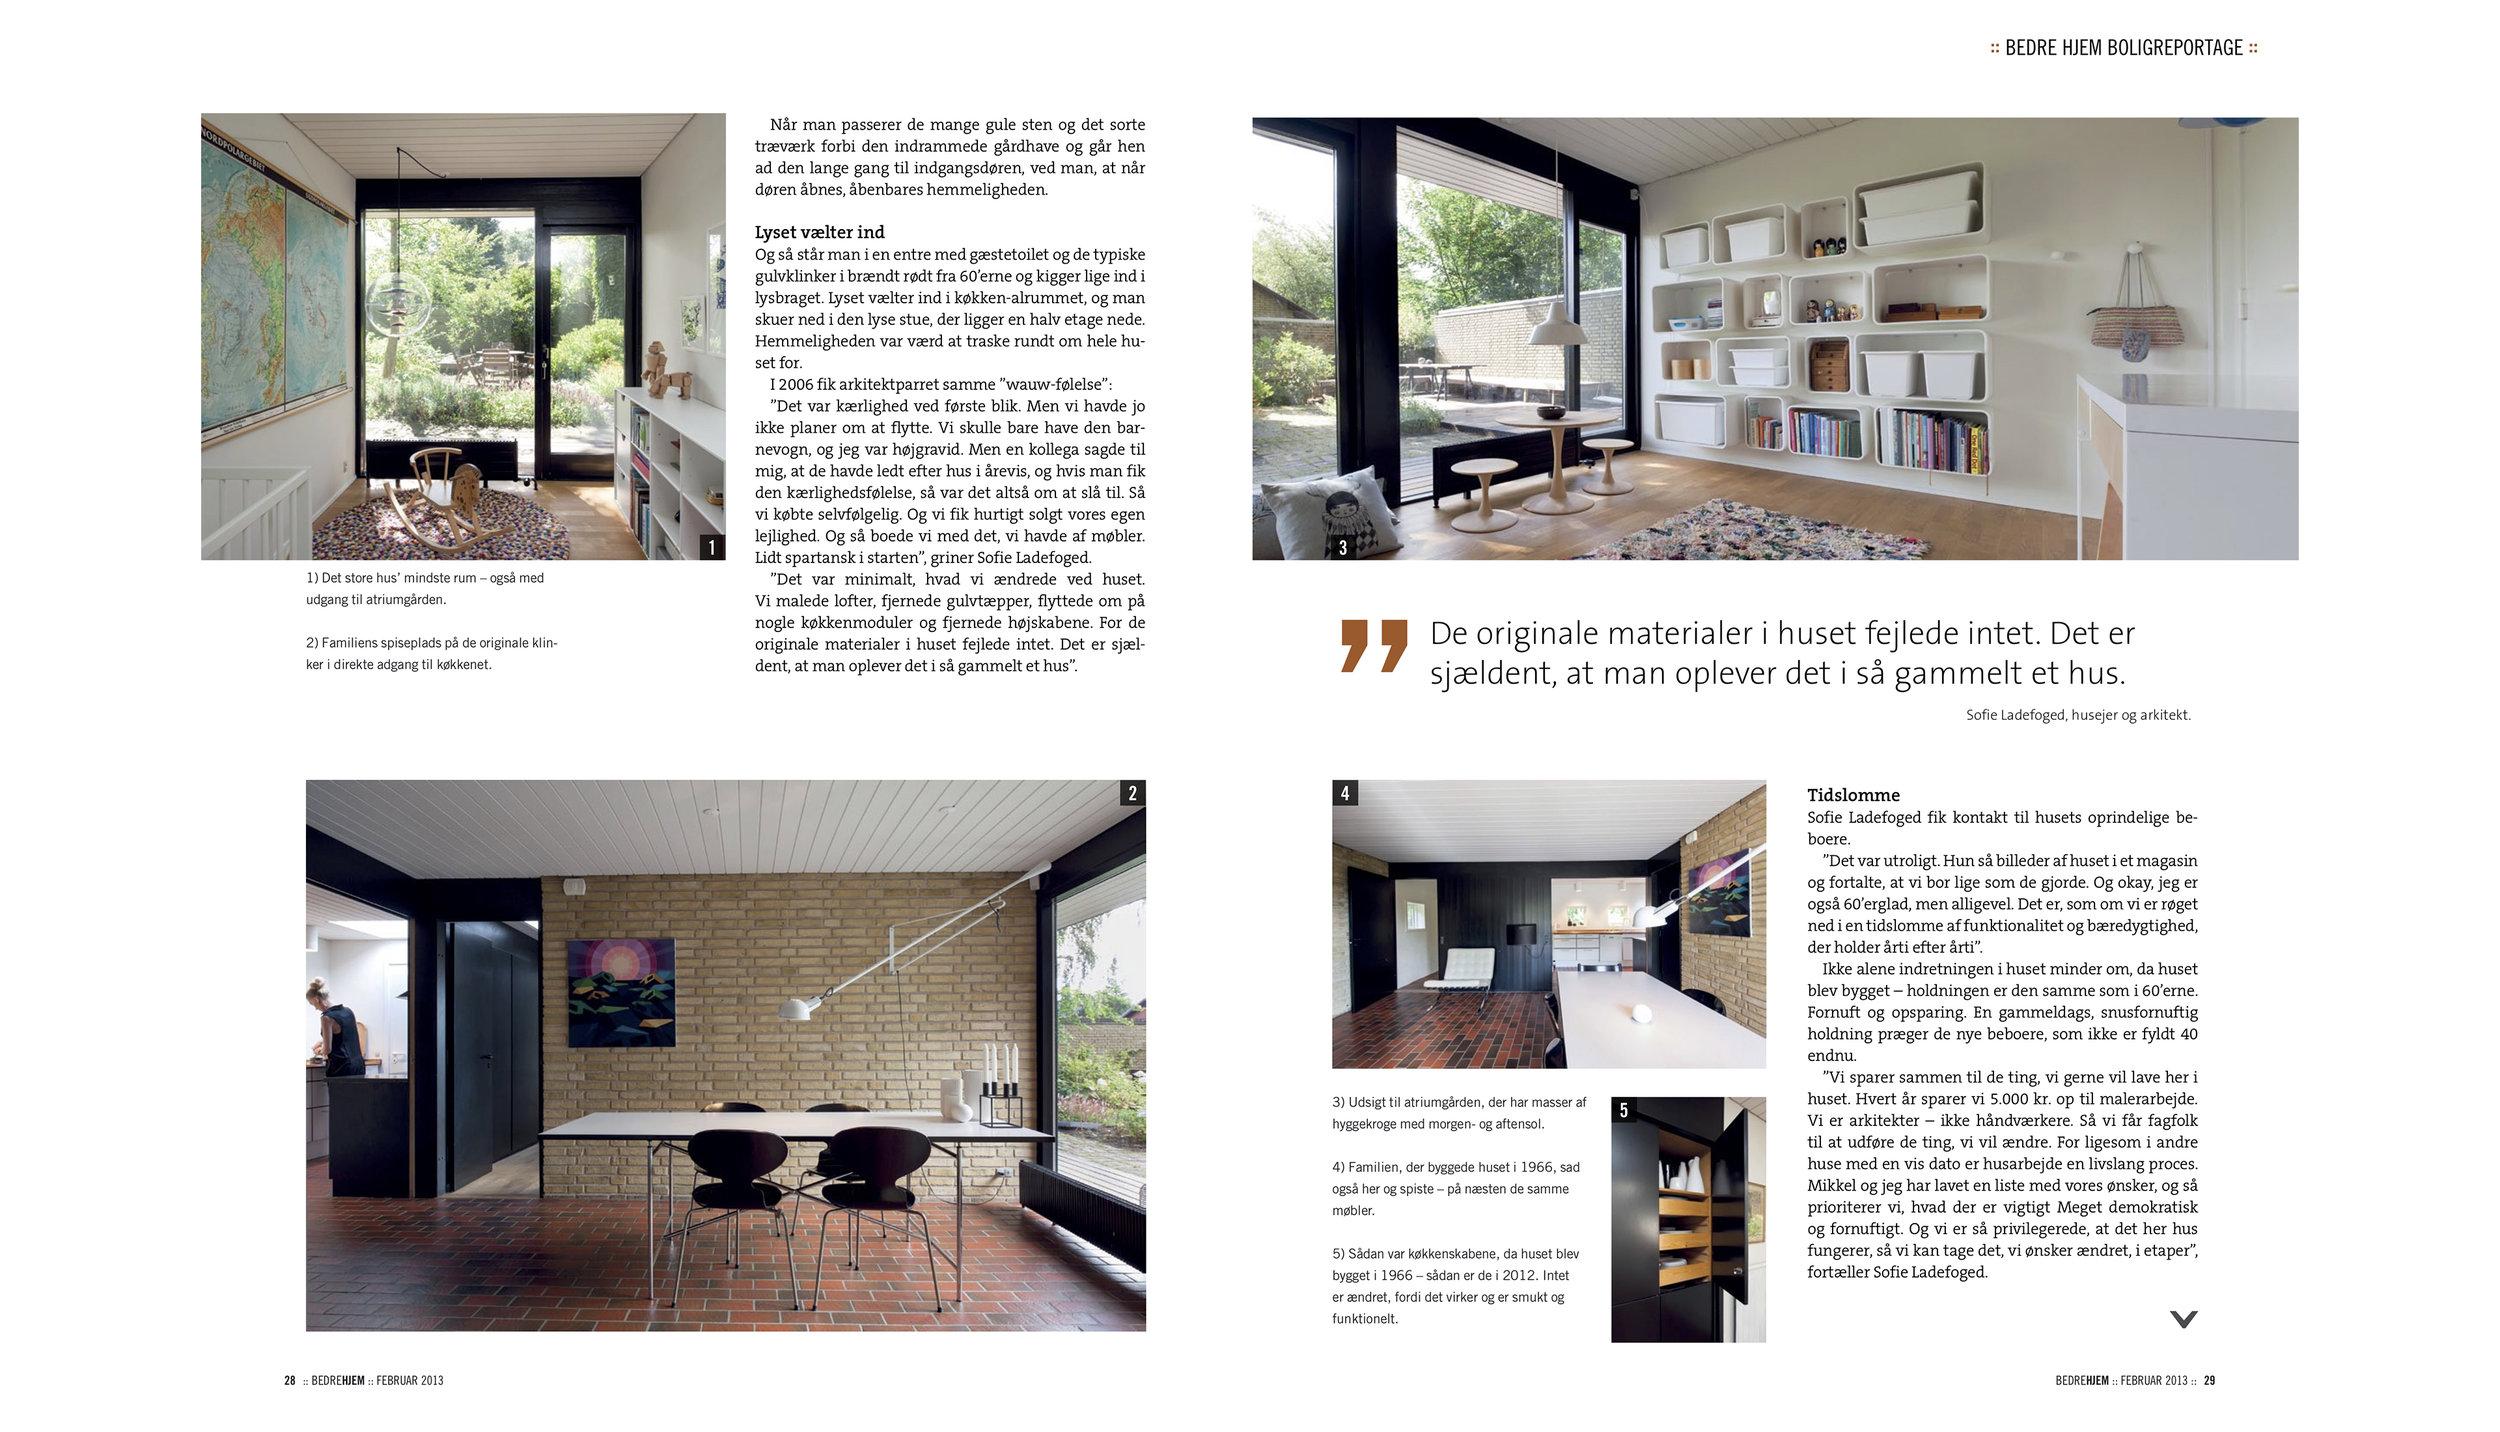 sofie-ladefoged-press-bolius-2013-page-04.jpg